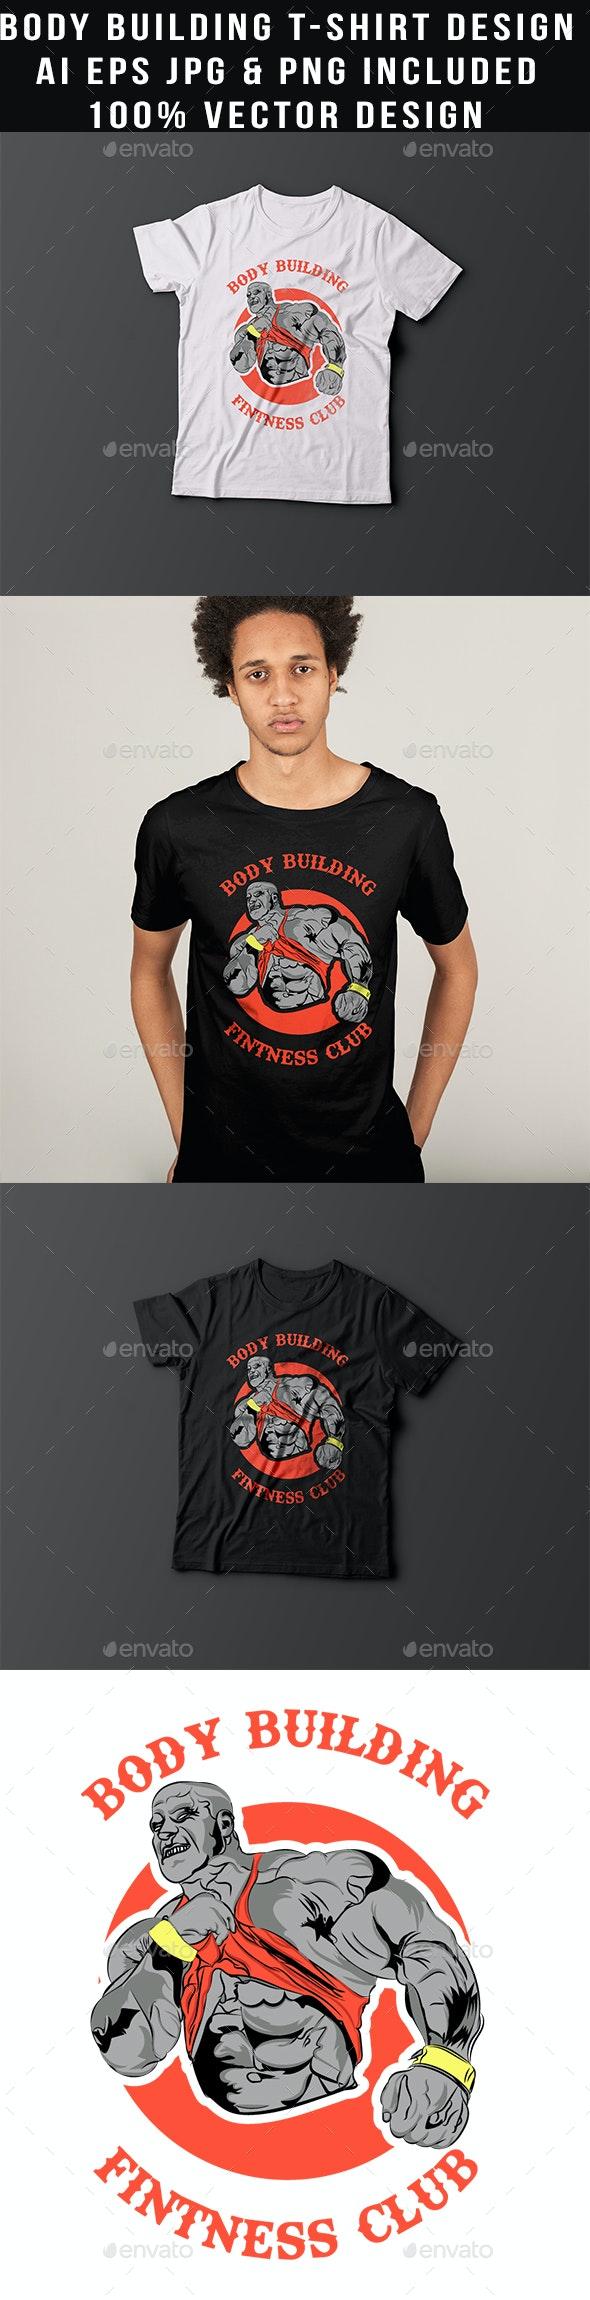 Bodybuilding t-shirt design - T-Shirts